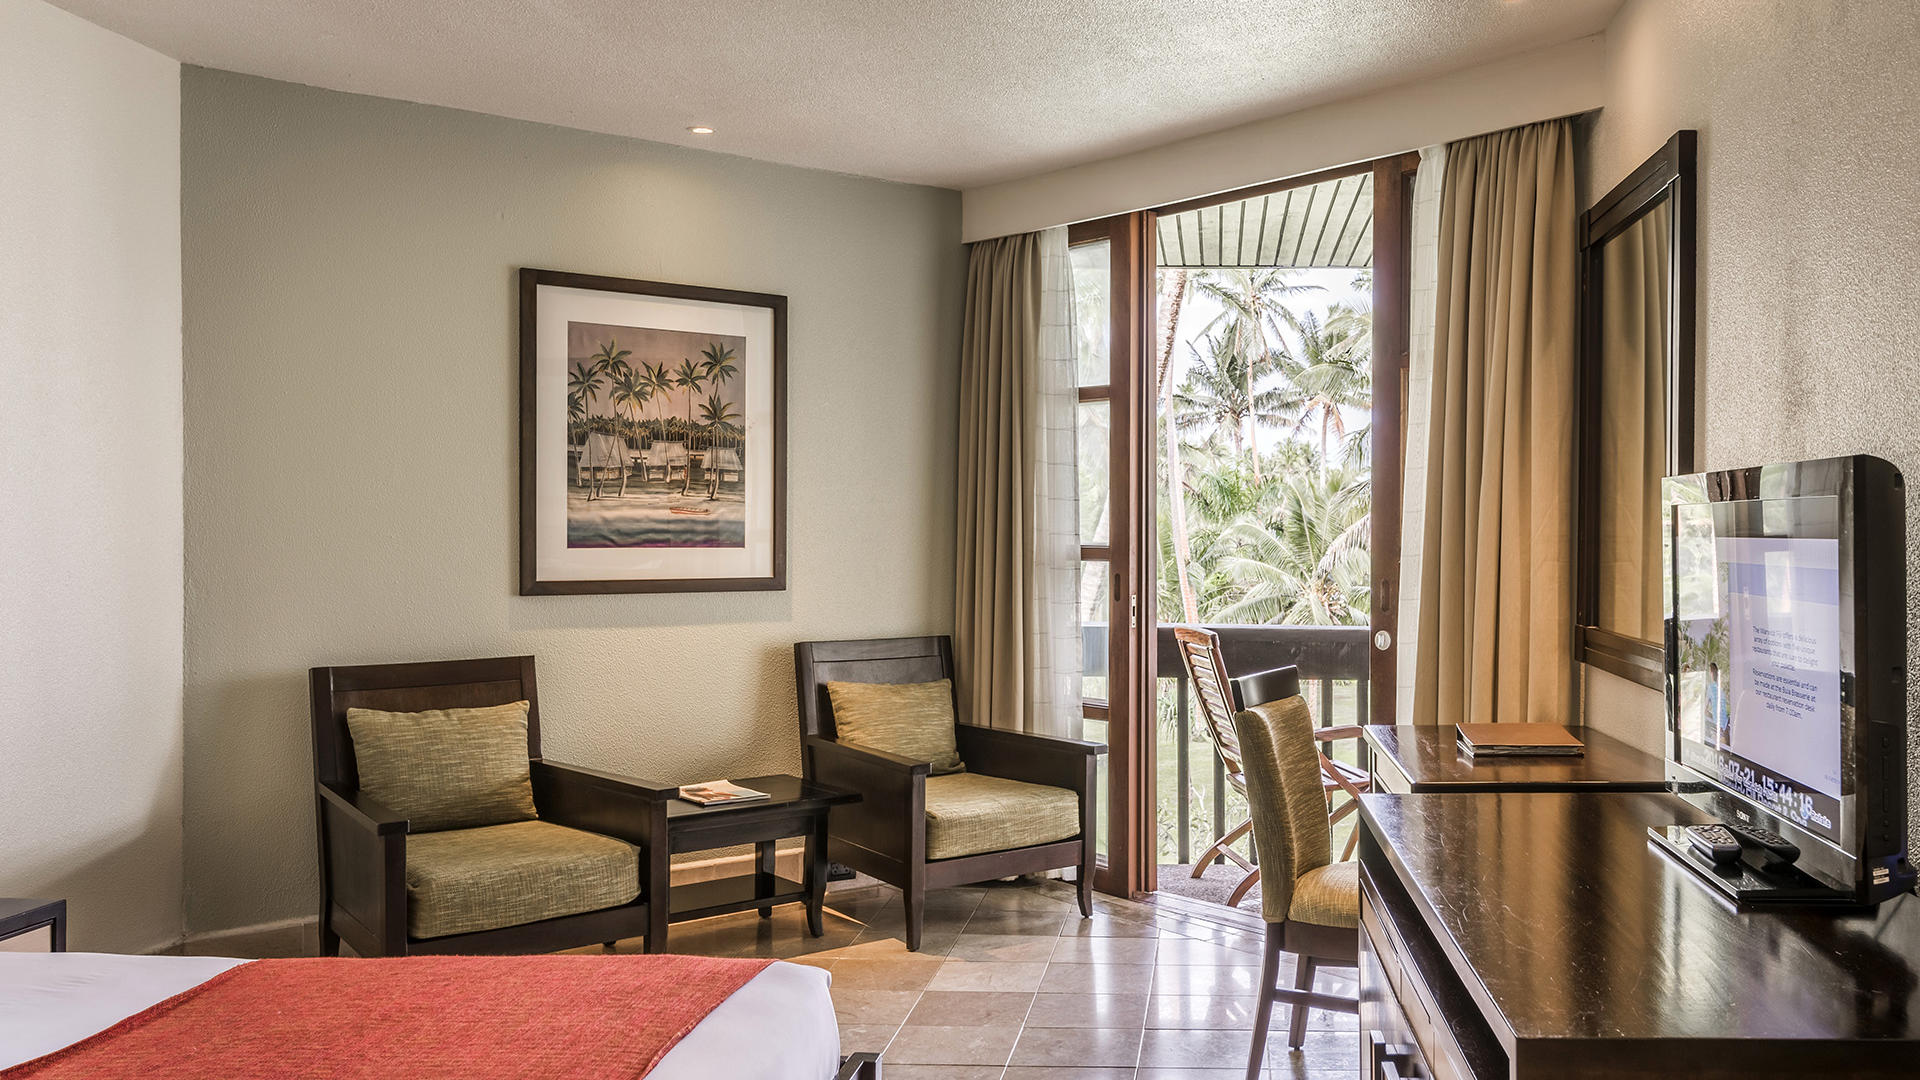 Fiji Vacation Offer 42% Special offer details